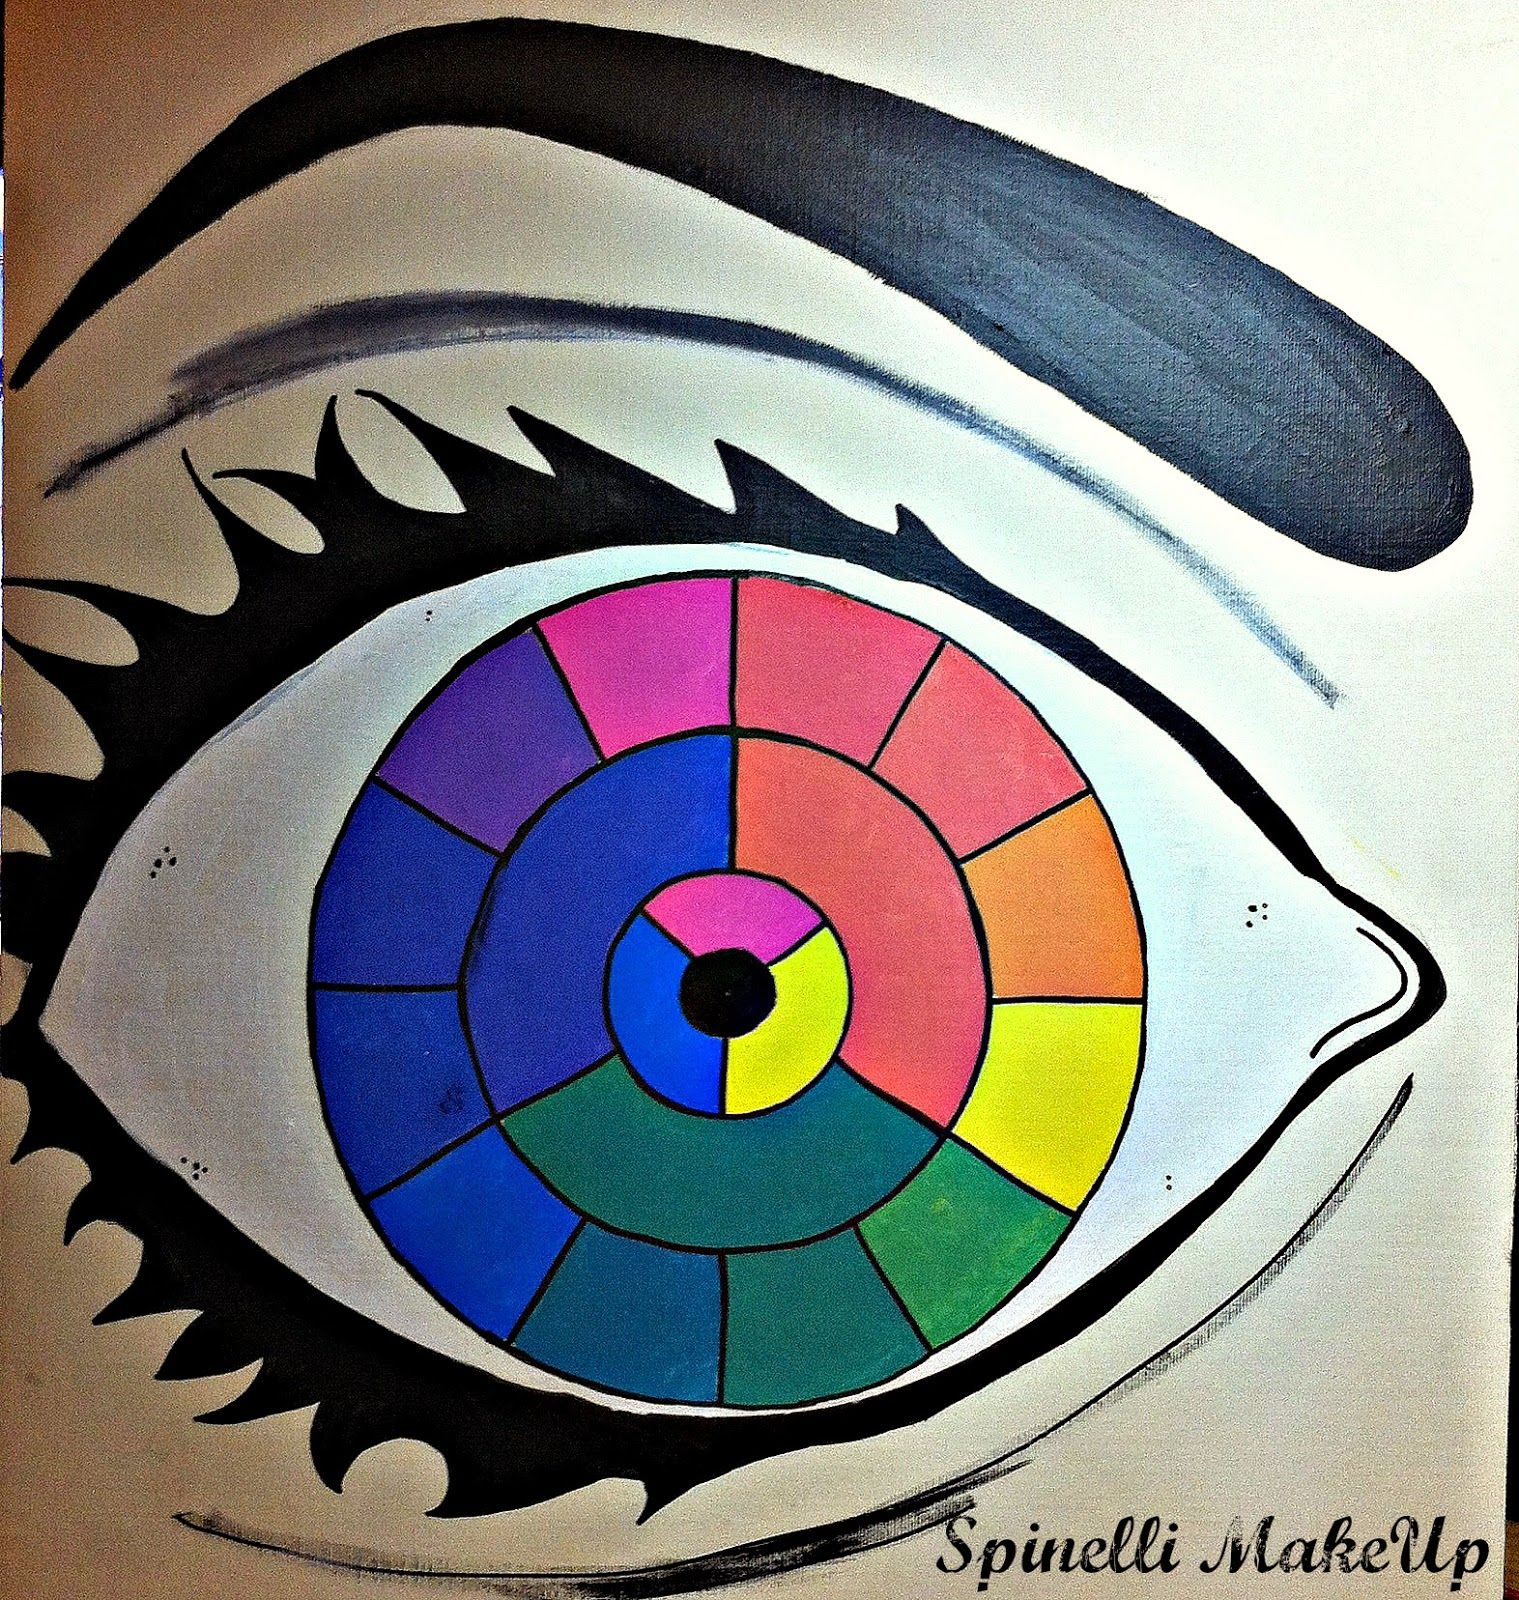 Spinelli Makeup Colores Calidos Y Frios Colores Calidos Y Frios Dibujos Calidos Y Frios Colores Calidos